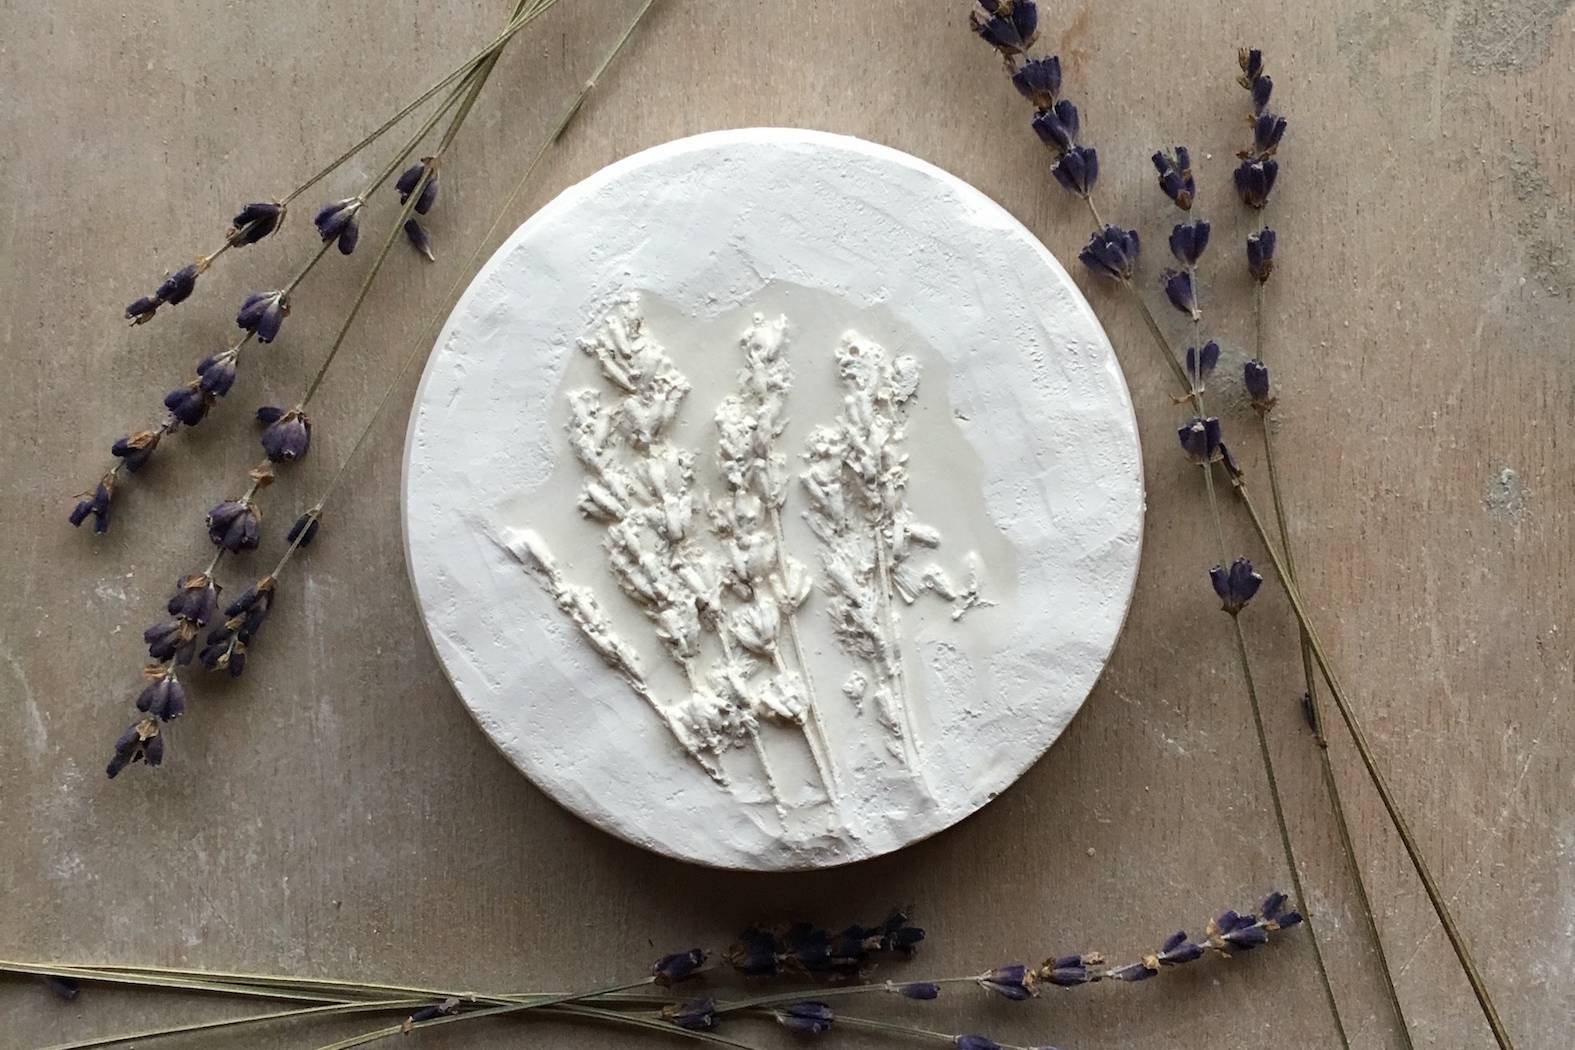 Keramik, Blüten, Künstlerin, handgemacht, Muster, Ton